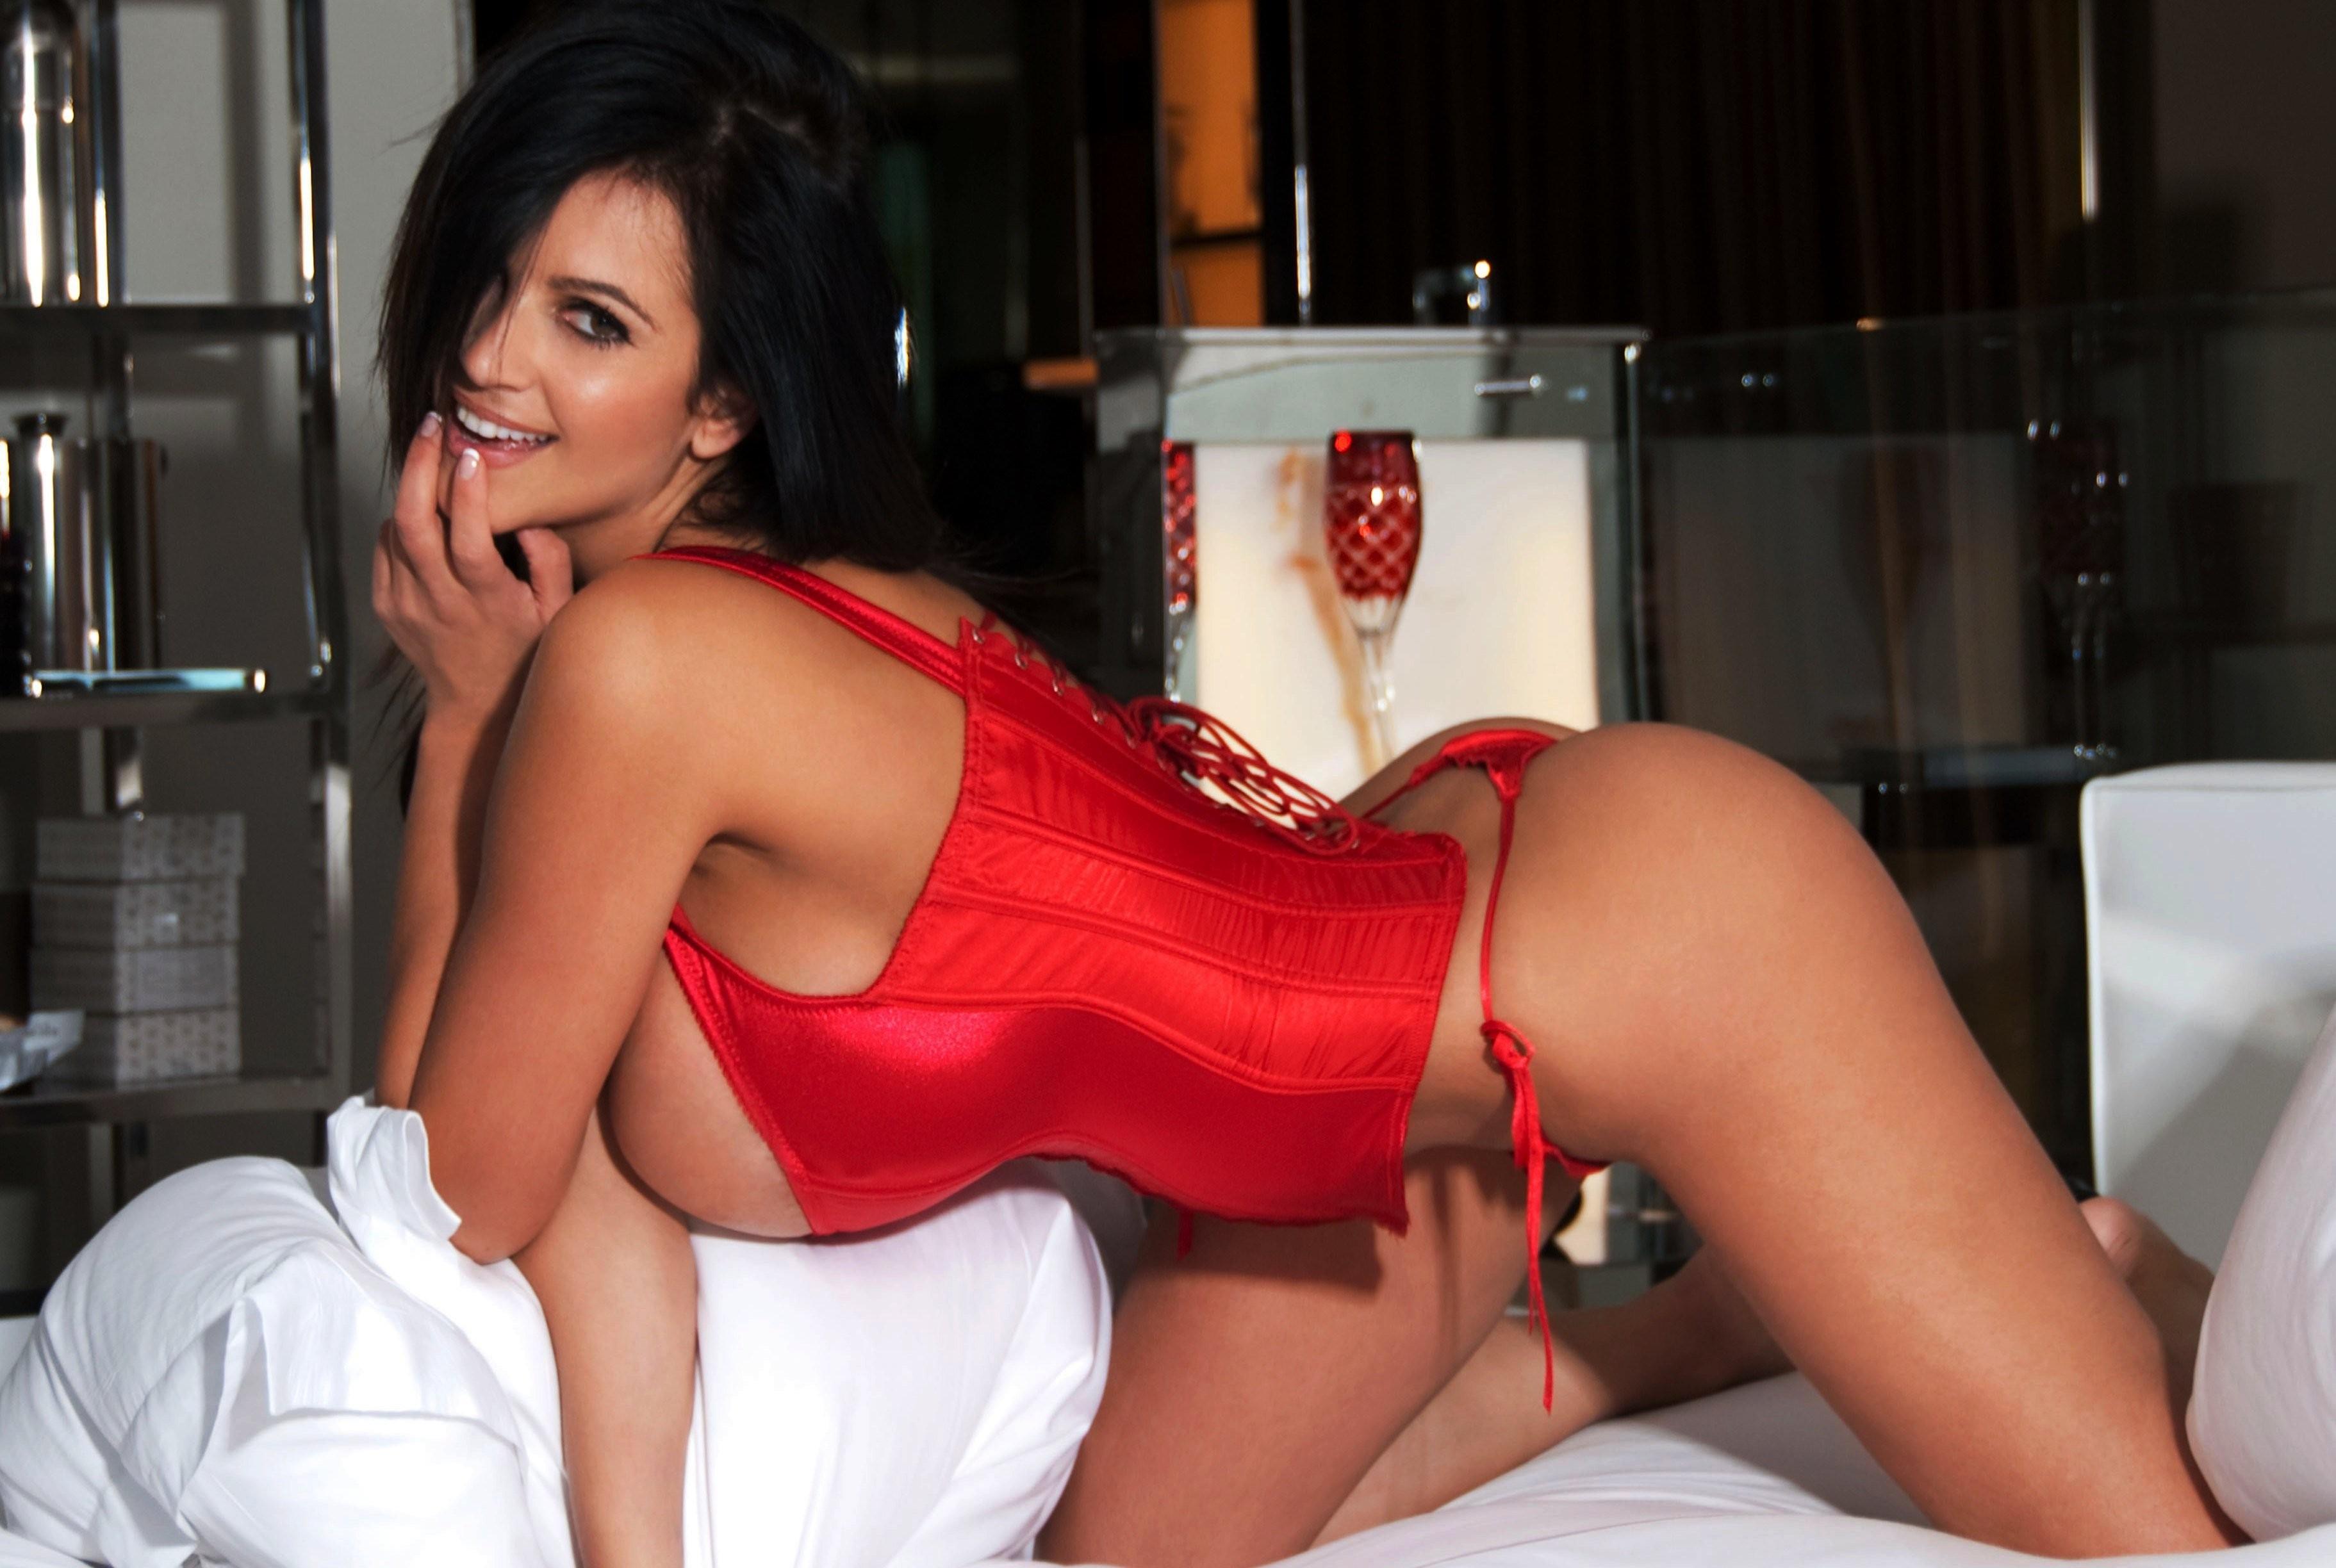 Denise Milani 4K